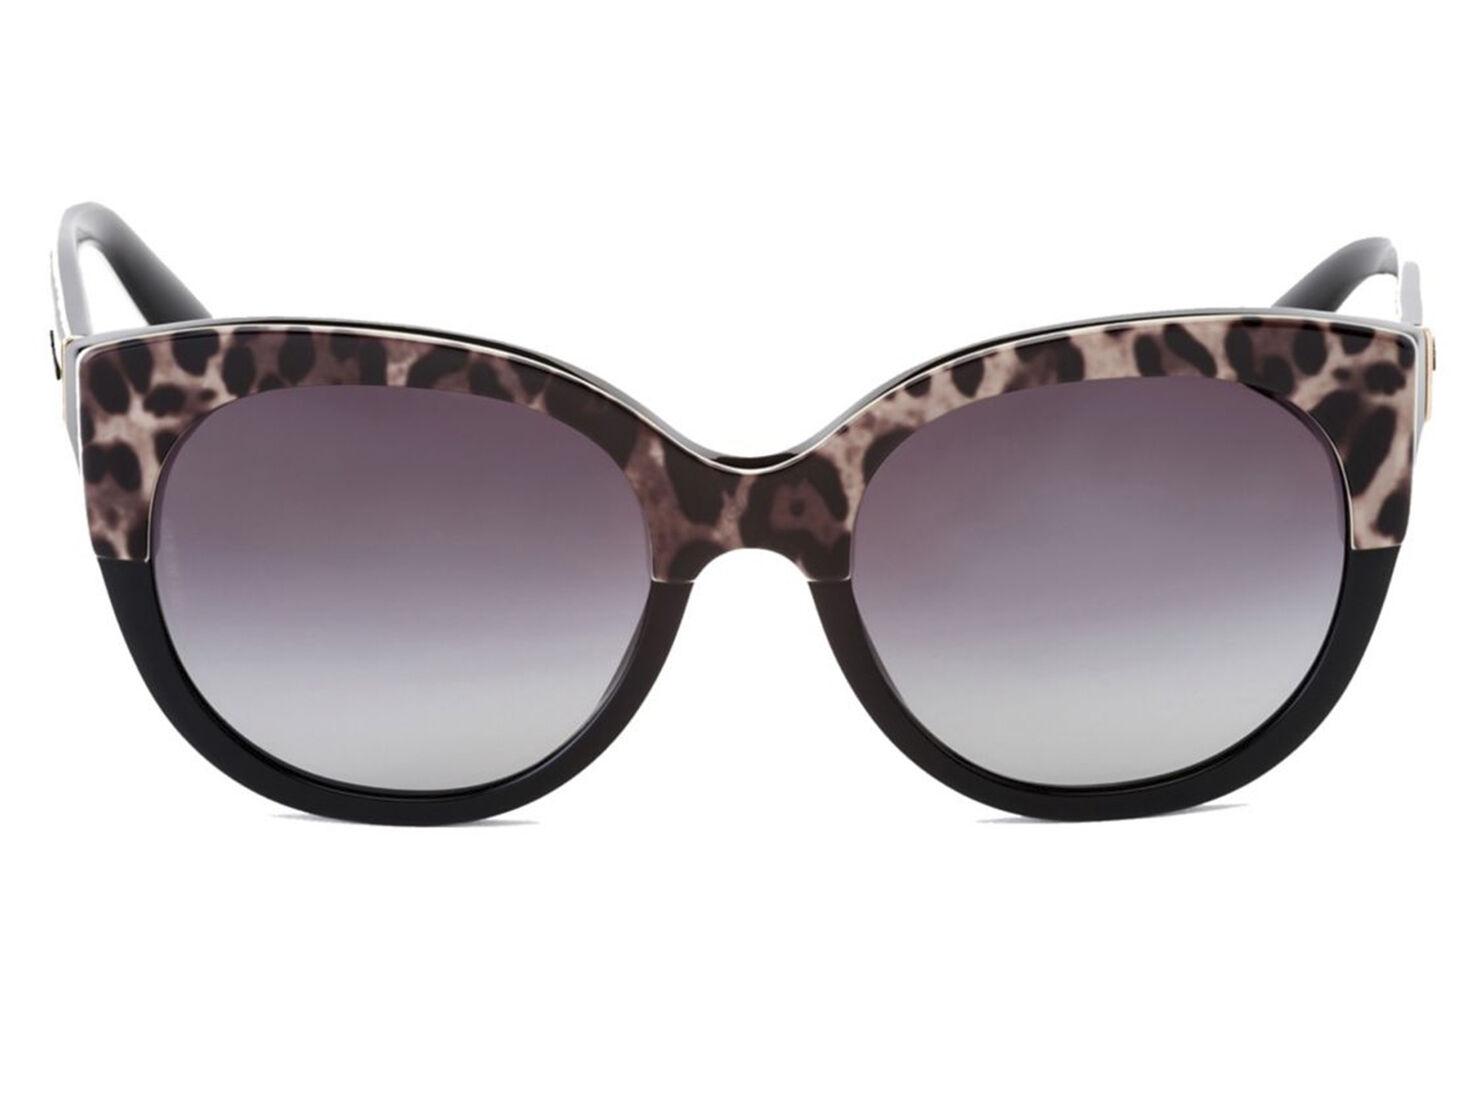 05c6a5a44e Lentes de Sol Dolce & Gabbana 4259 Mujer en Lentes de Sol | Paris